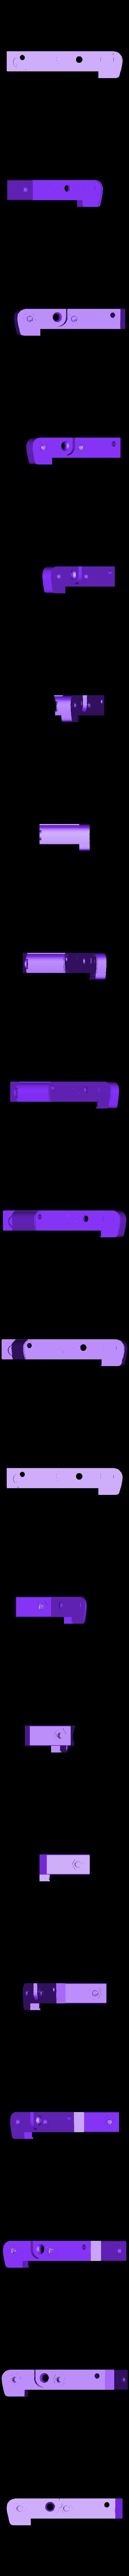 rx100m5a-bracket.stl Download free STL file Sony DSC RX100VA RX100M5A Bracket Grip Extension • 3D print template, whoopsie